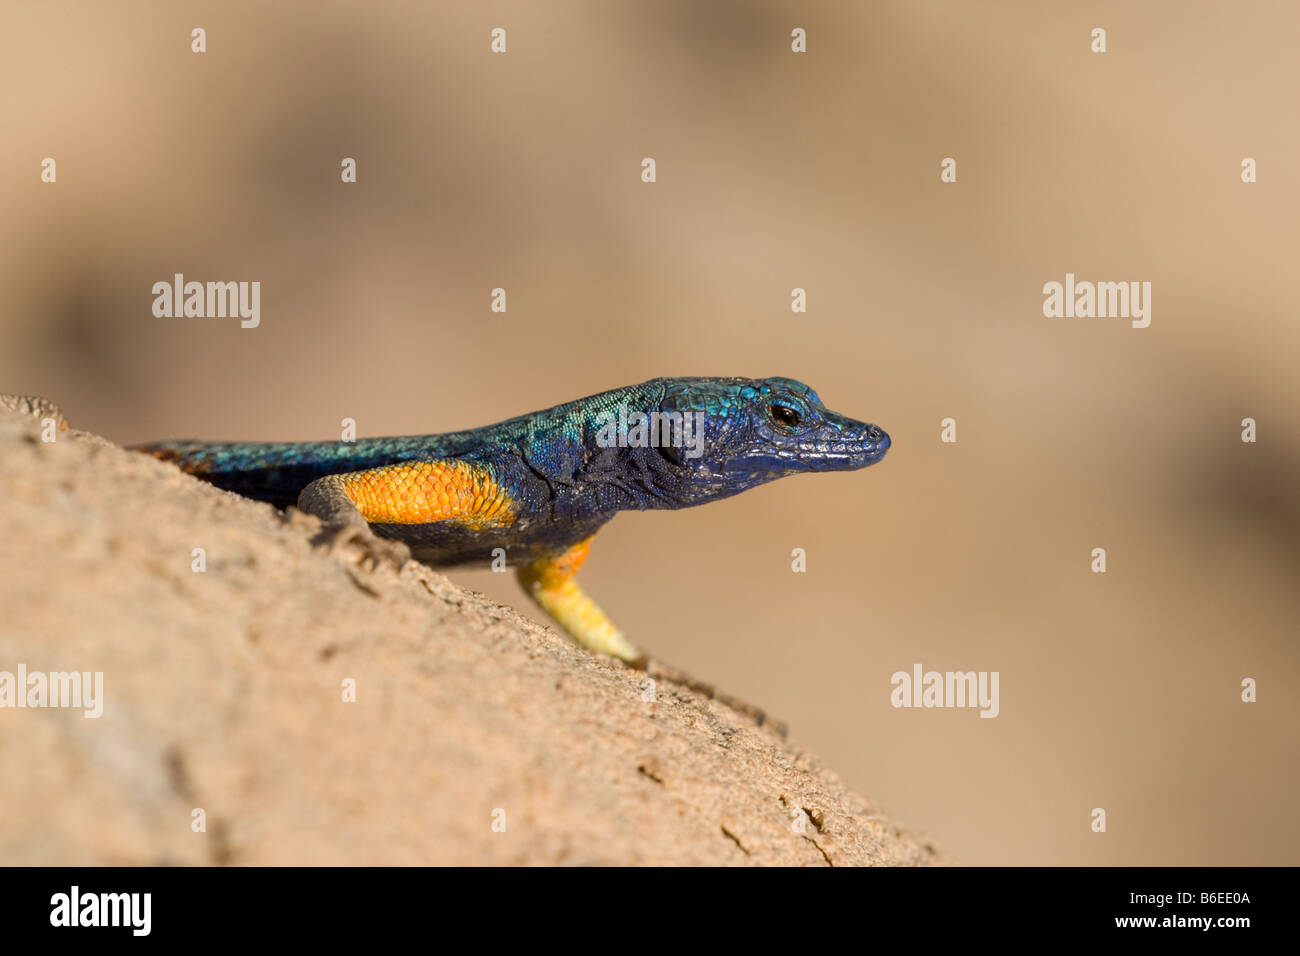 South Africa Augrabies Falls National Park Morning sun lights Augrabies flat lizard Stock Photo